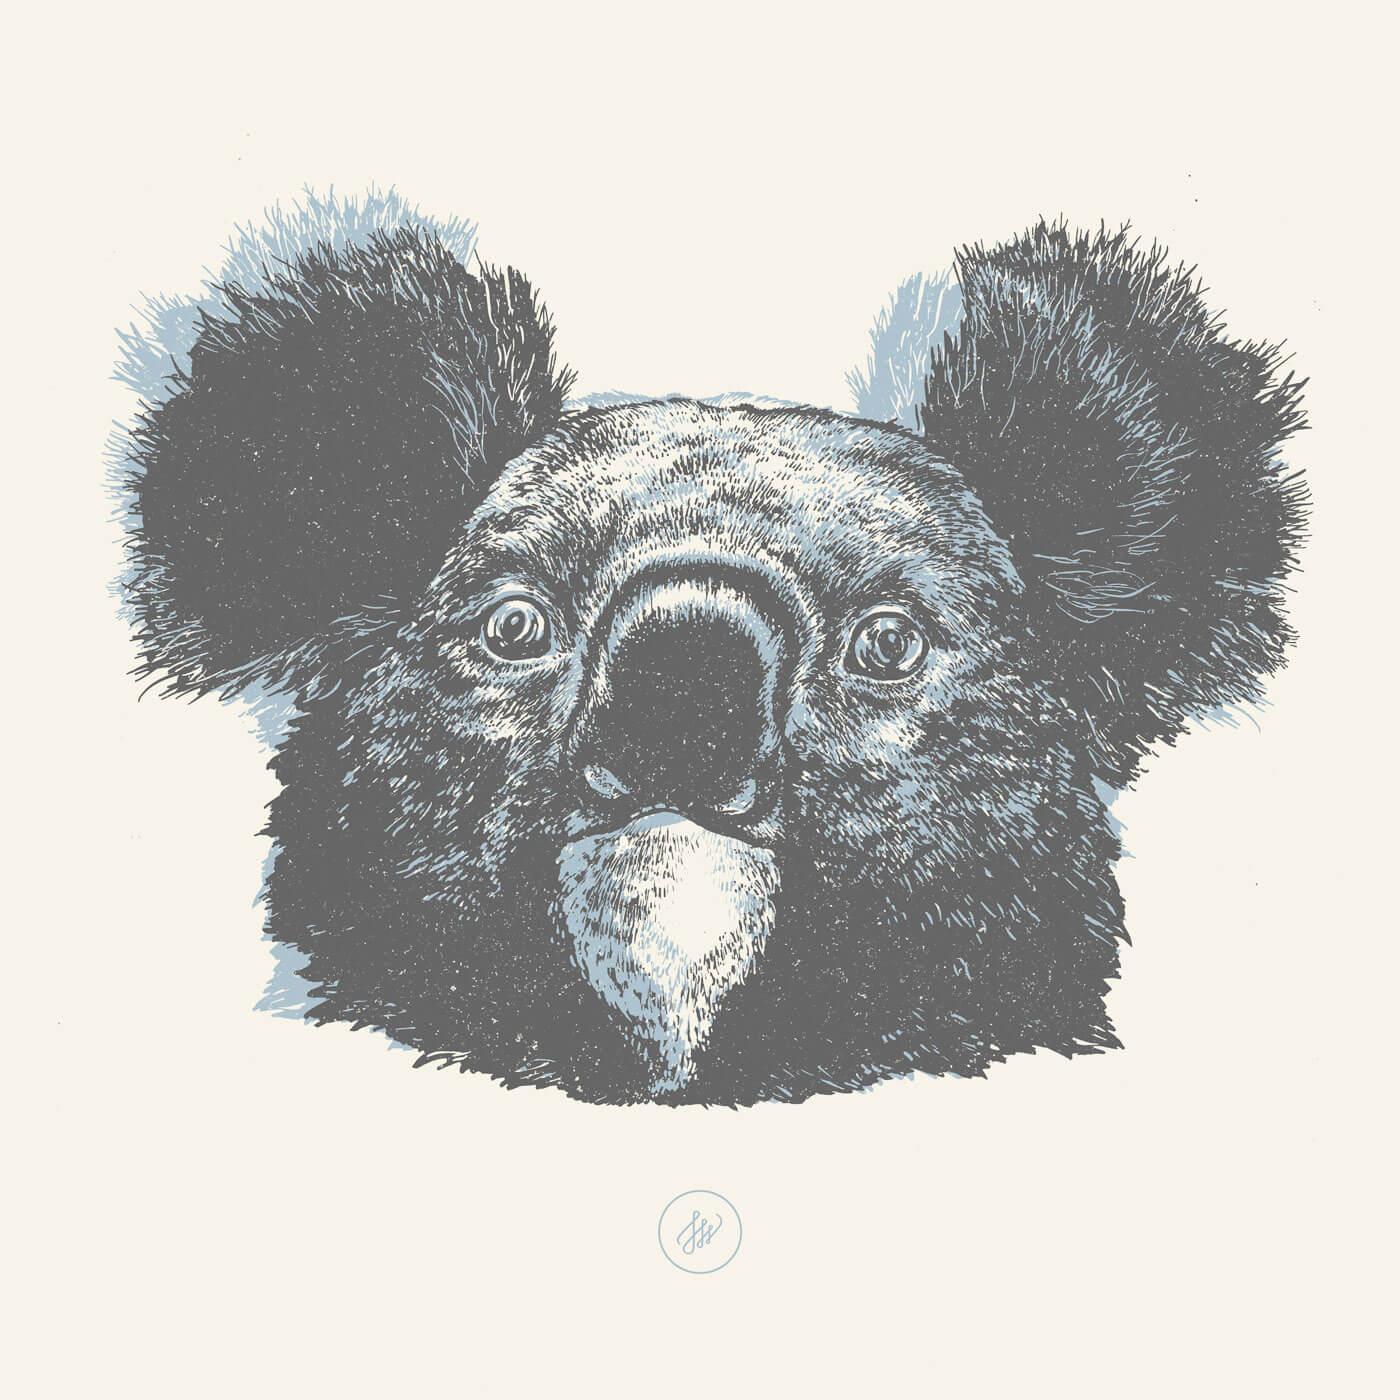 Joanna-Walczykowska-Koala